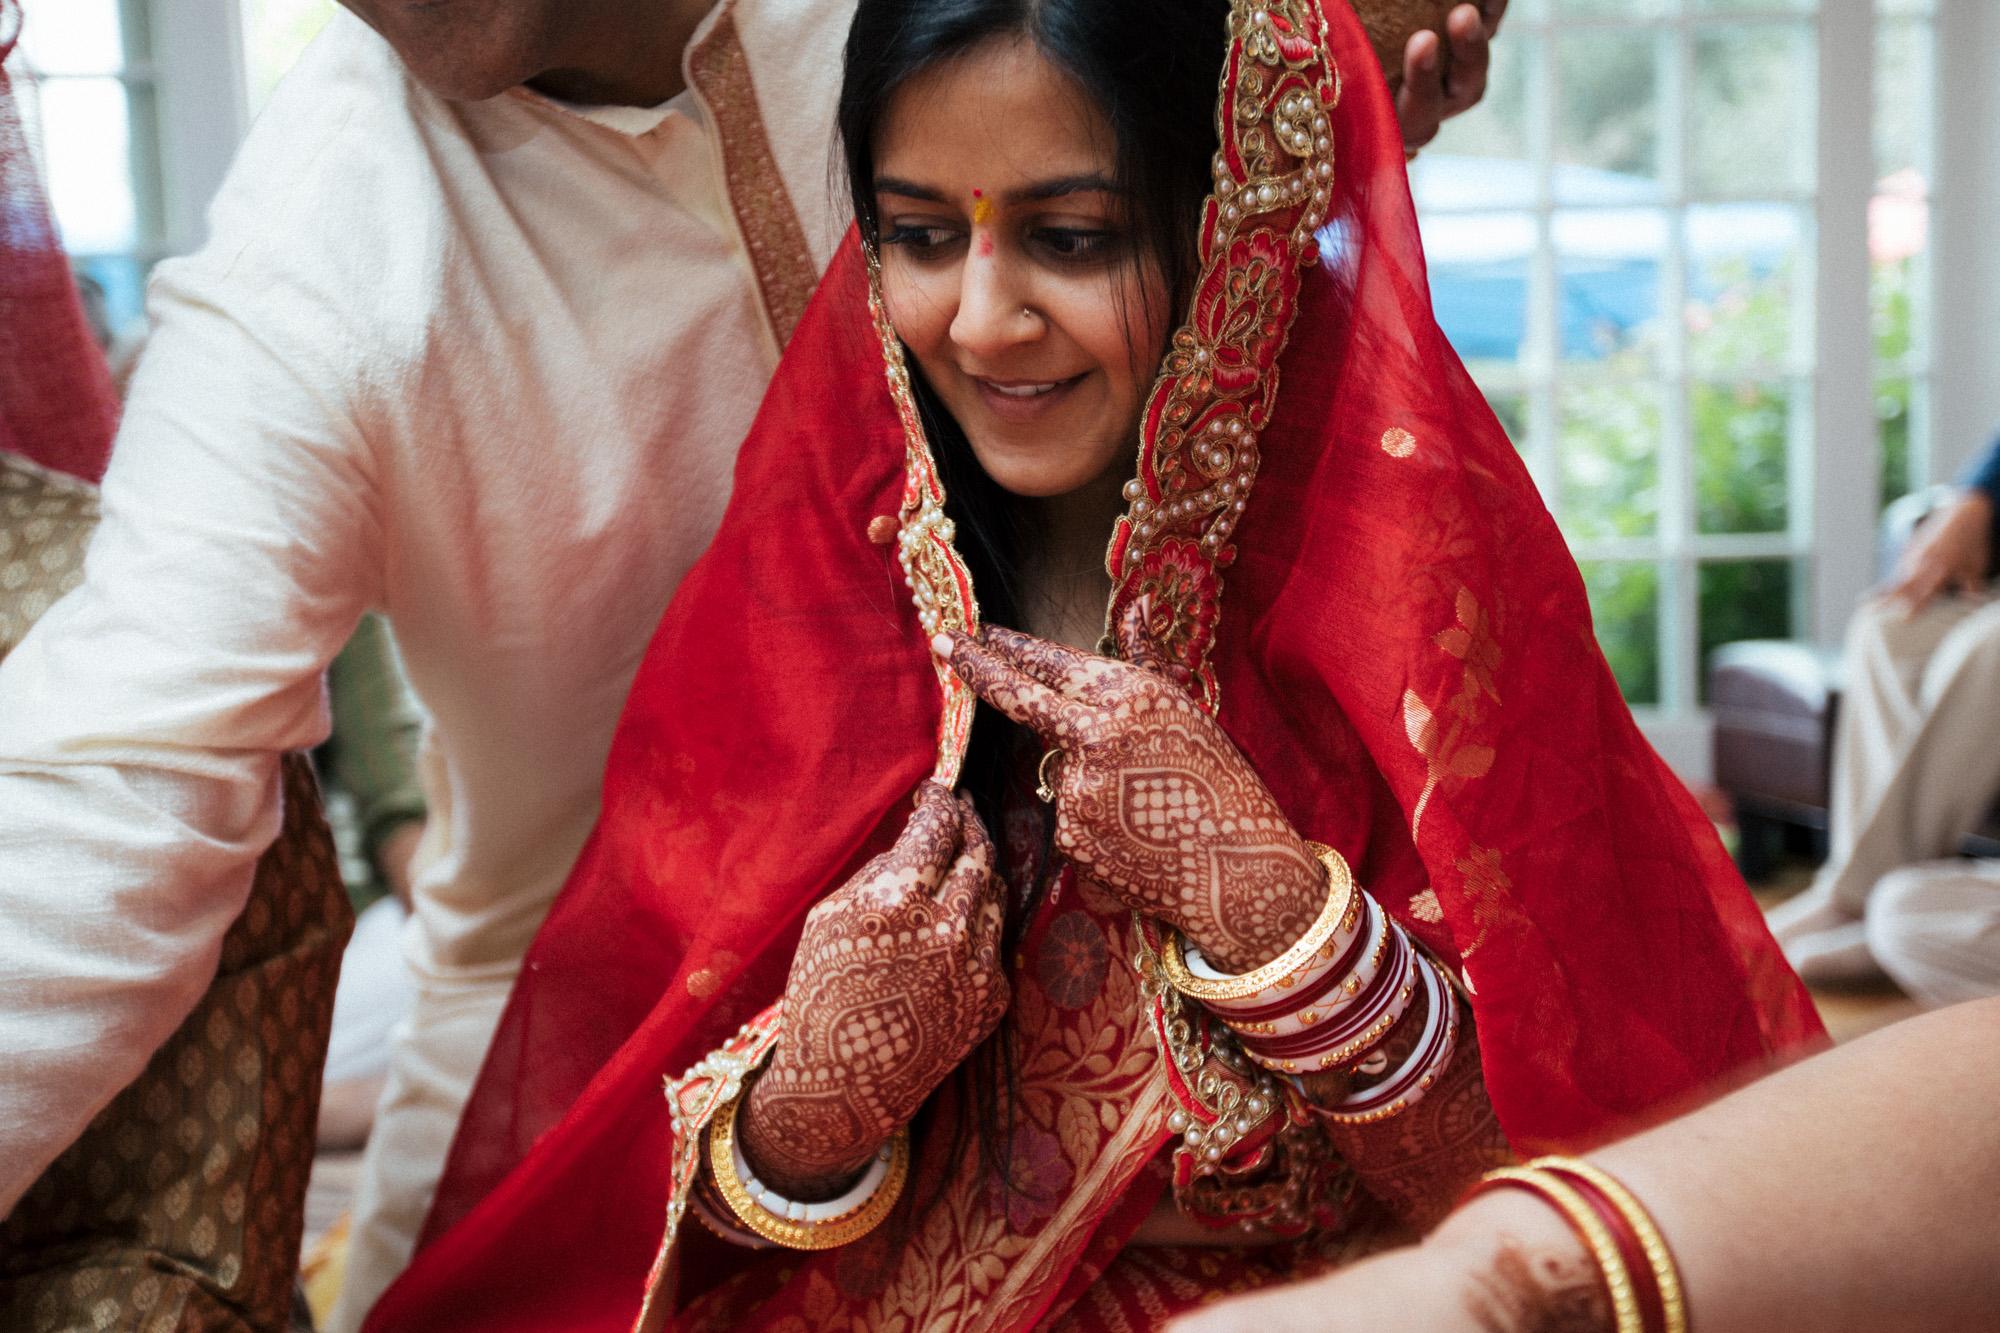 anu_maneesh_alec_vanderboom_Indian_wedding_photography-0191.jpg